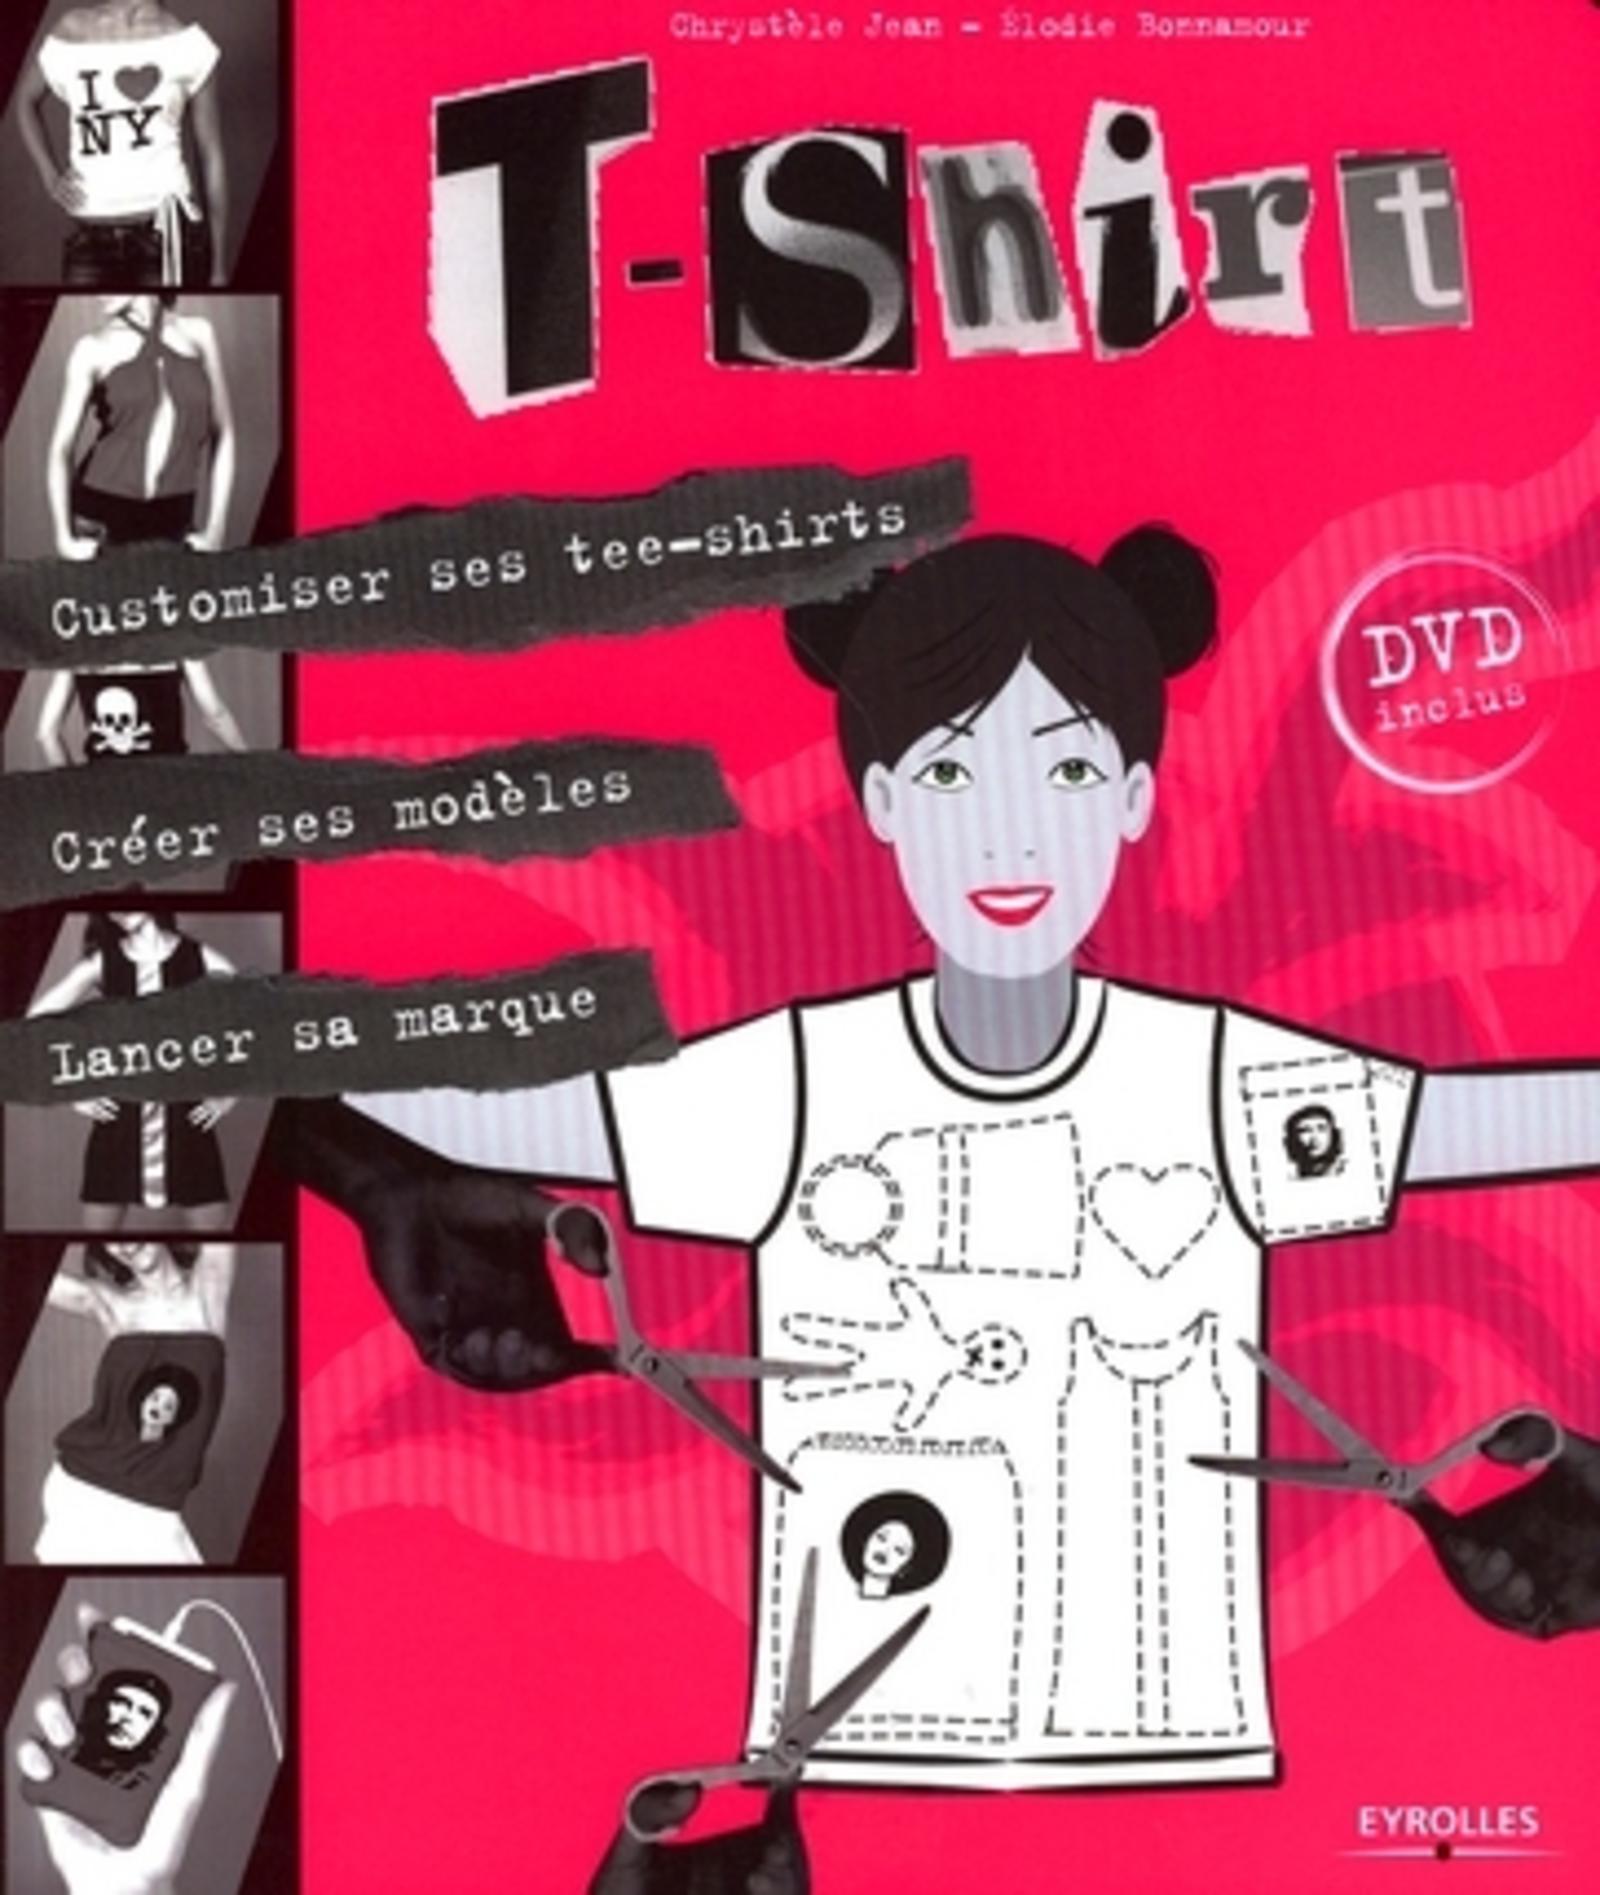 T-SHIRT : CUSTOMISER SES TEE-SHIRTS, CREER SES MODELES, LANCER SA MARQUE. LIVRE+